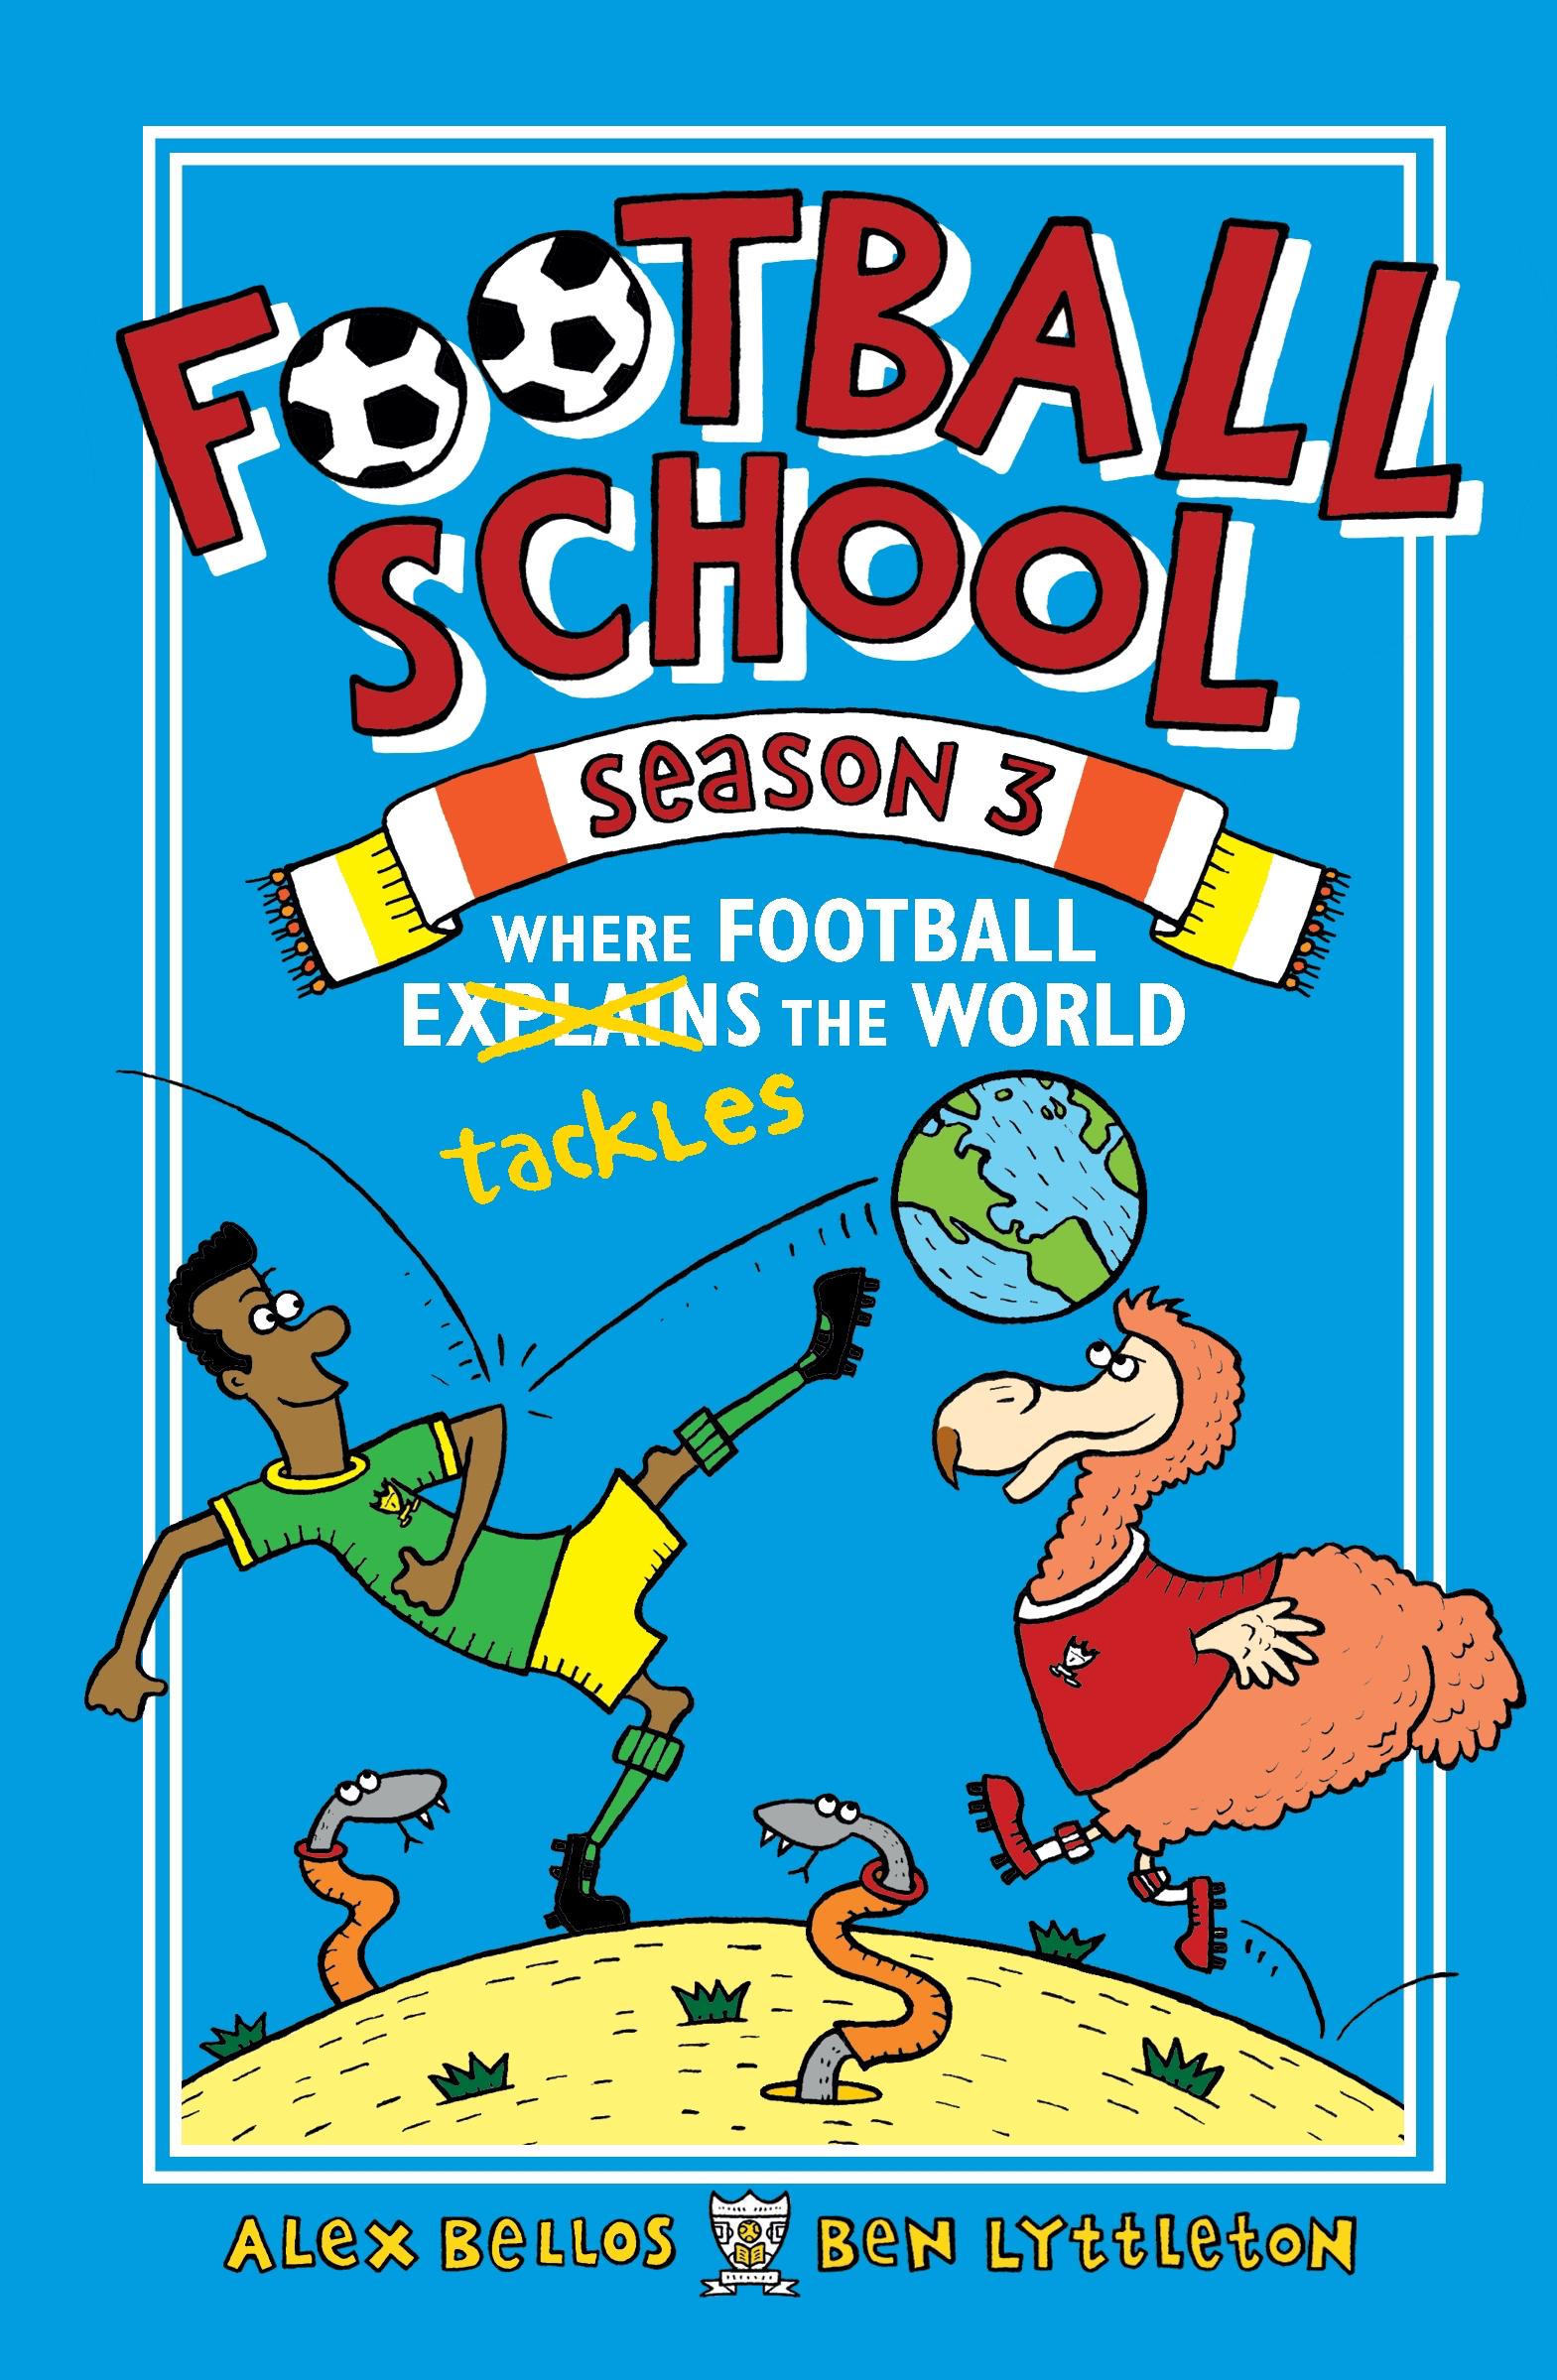 Football Season 3 cover .jpg